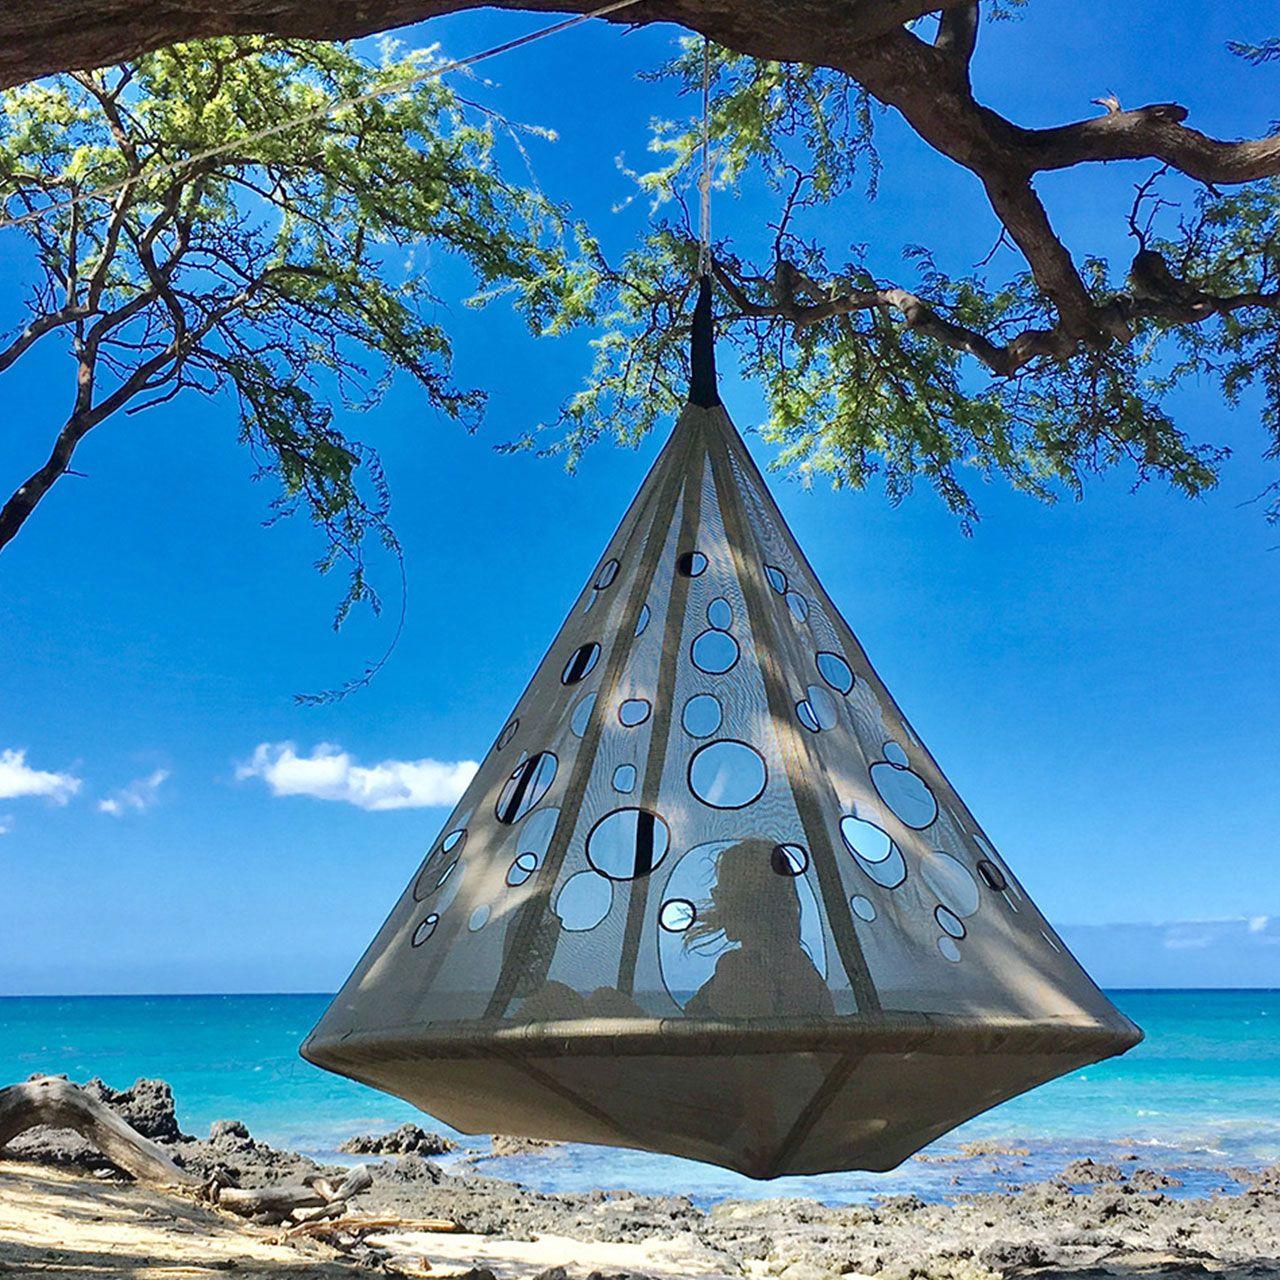 Let The Moon Drop Discover Moondrop Hanging Chairs On Hammocktown Com Https Hammocktown Com Product Beach Gadgets Hanging Hammock Chair Hanging Hammock